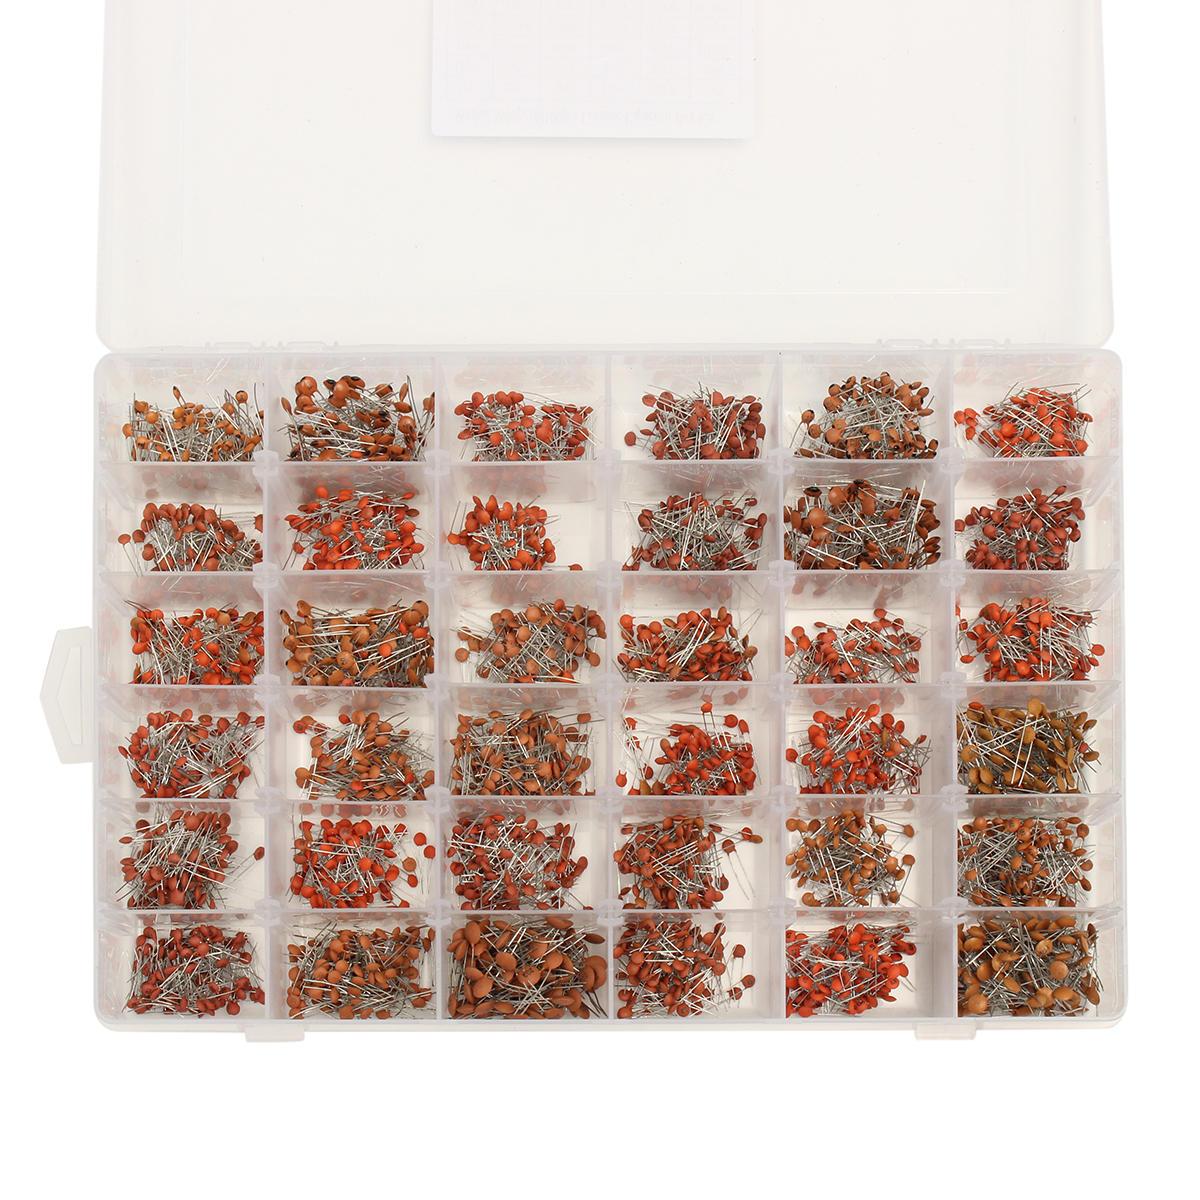 3600 ceramic capacitor variedade kit pcs lote 1pf 100nf 10pf 22pf 33pf 47pf 100pf